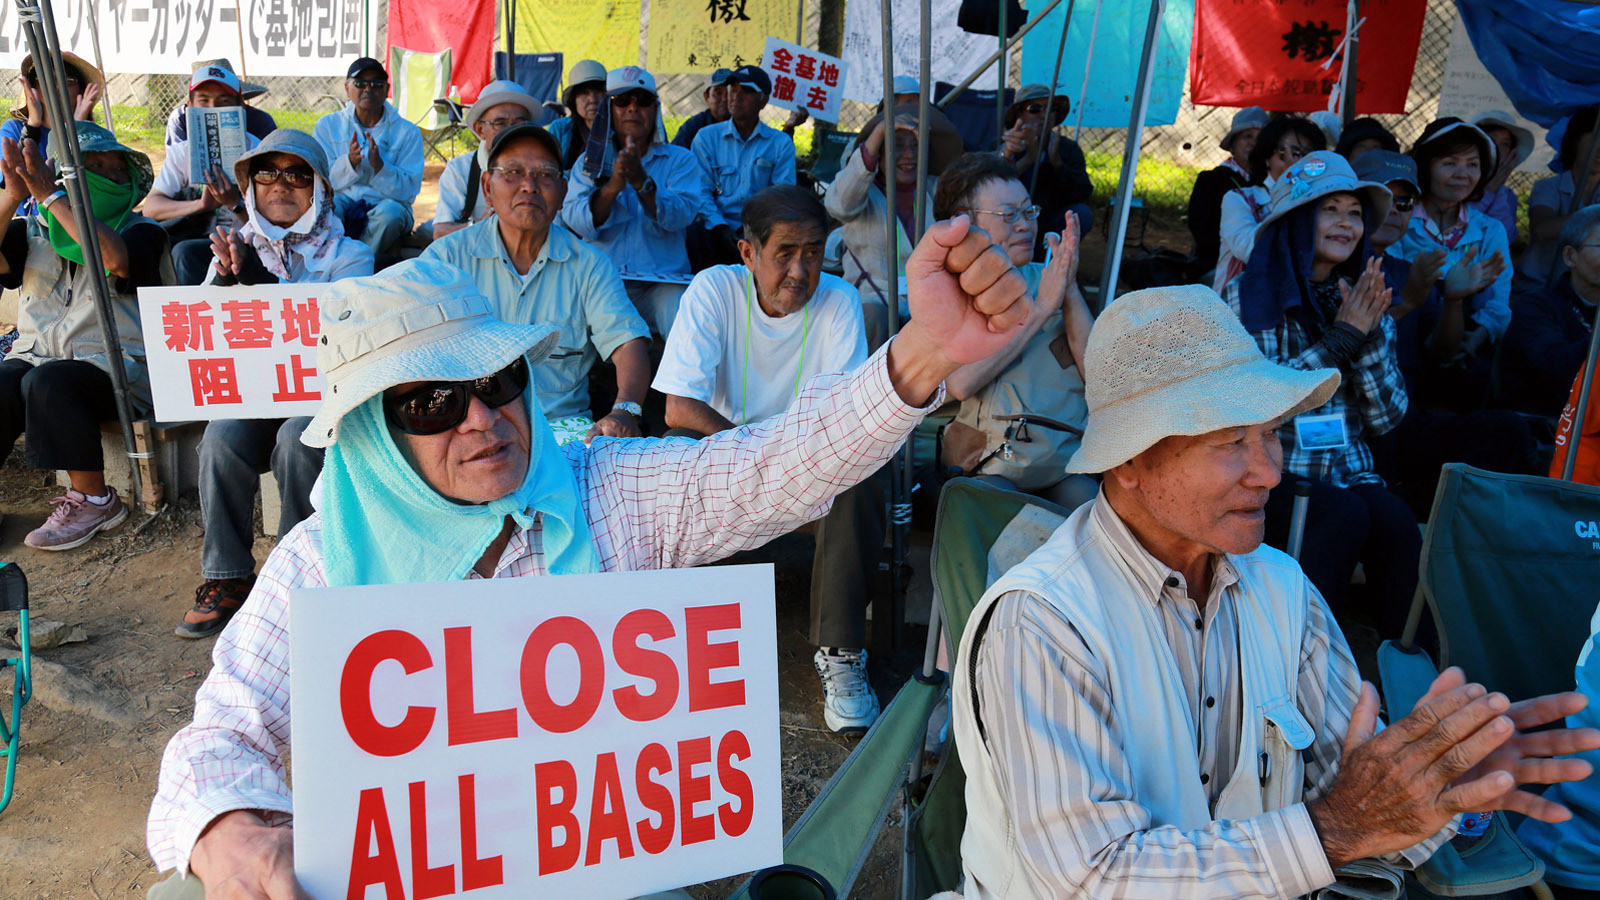 la-fg-okinawa-battle-us-bases-japan-20150917